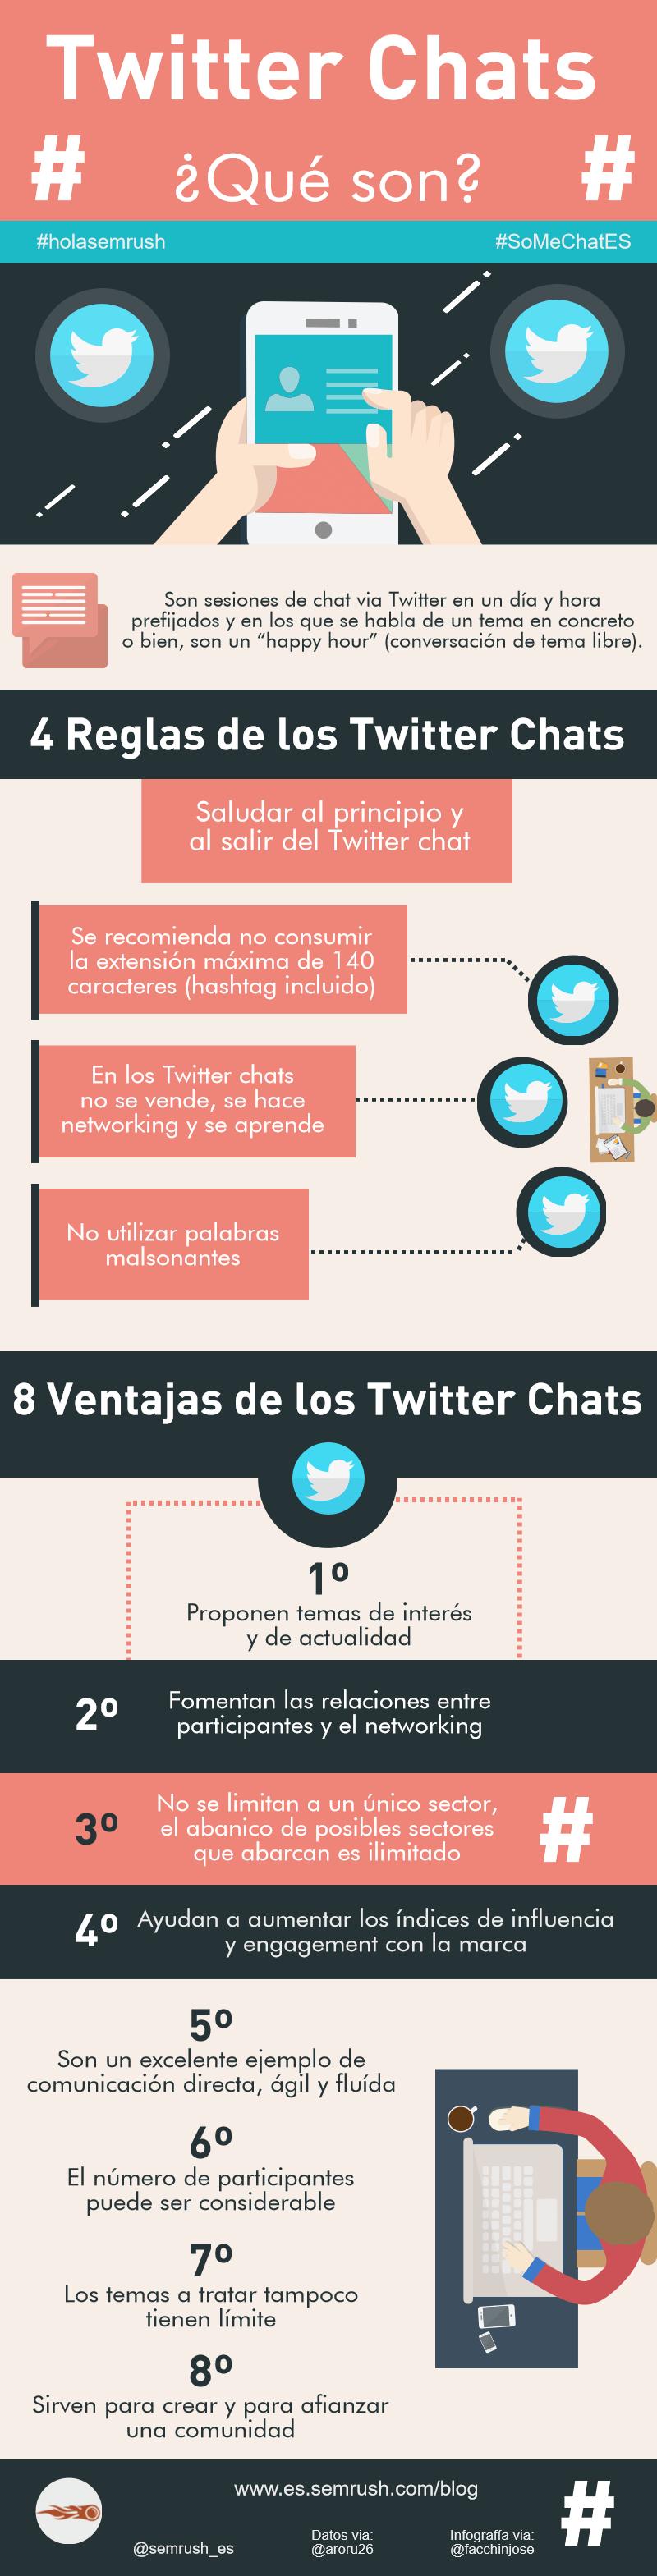 Twitter chats: Todo lo que debes de saber